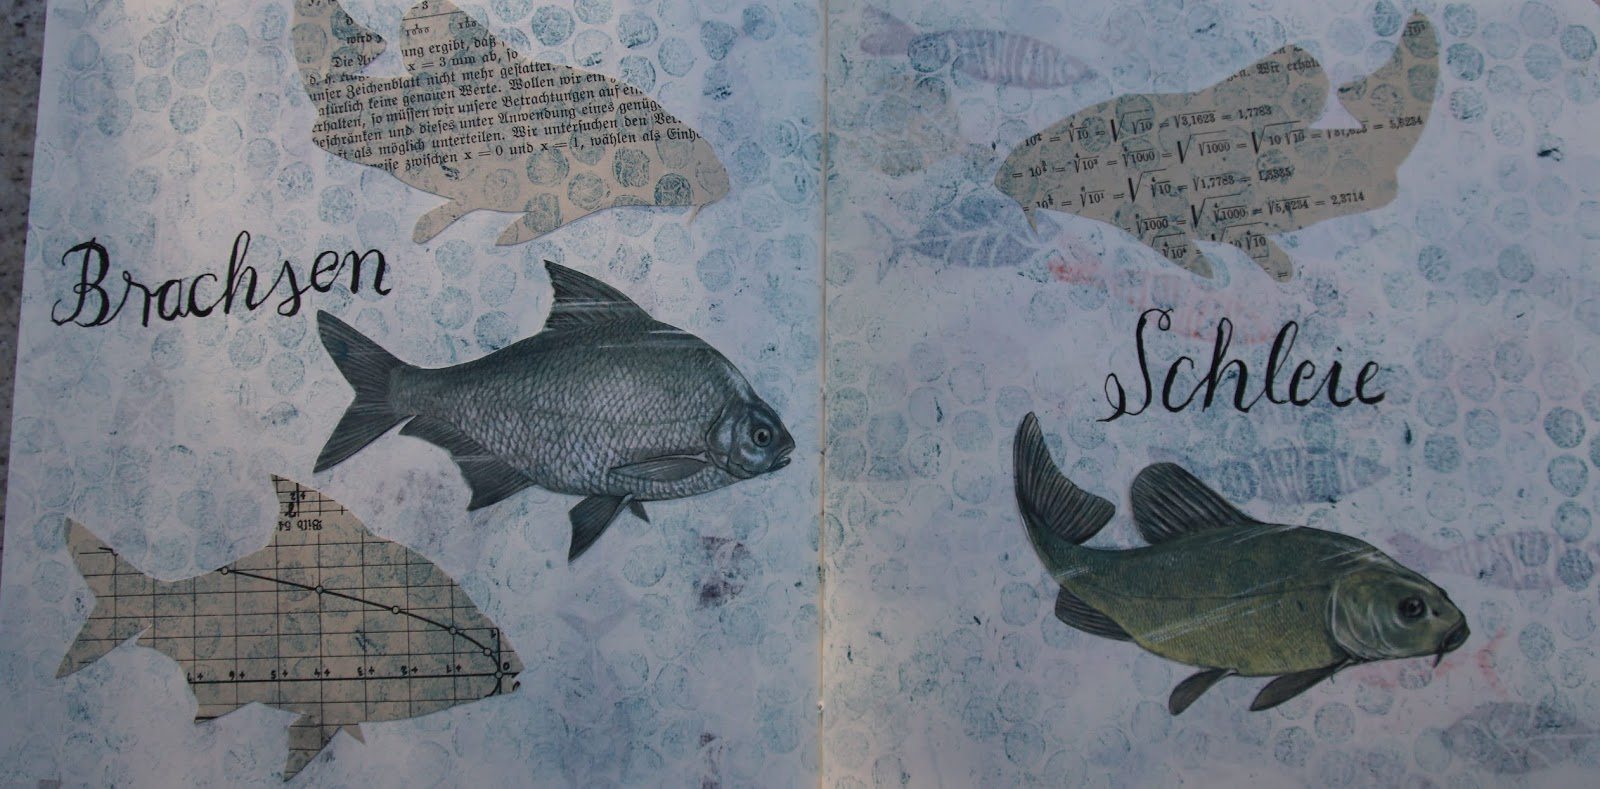 Kunstnadel Fisch Am Mittwoch